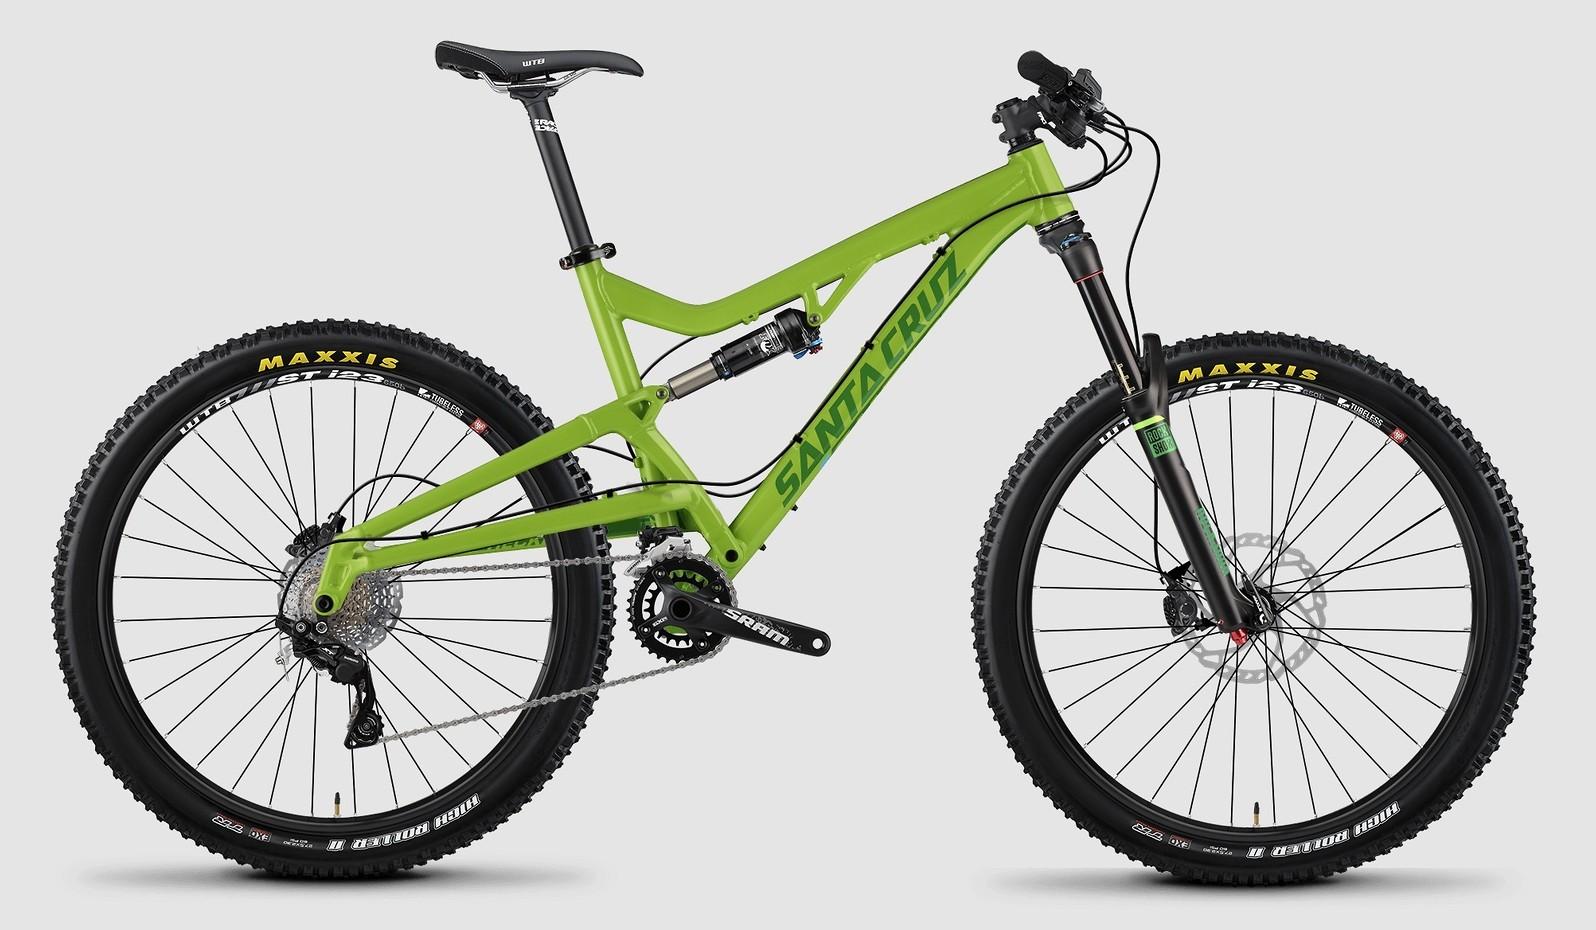 bike - 2015 Santa Cruz Heckler R - lime green